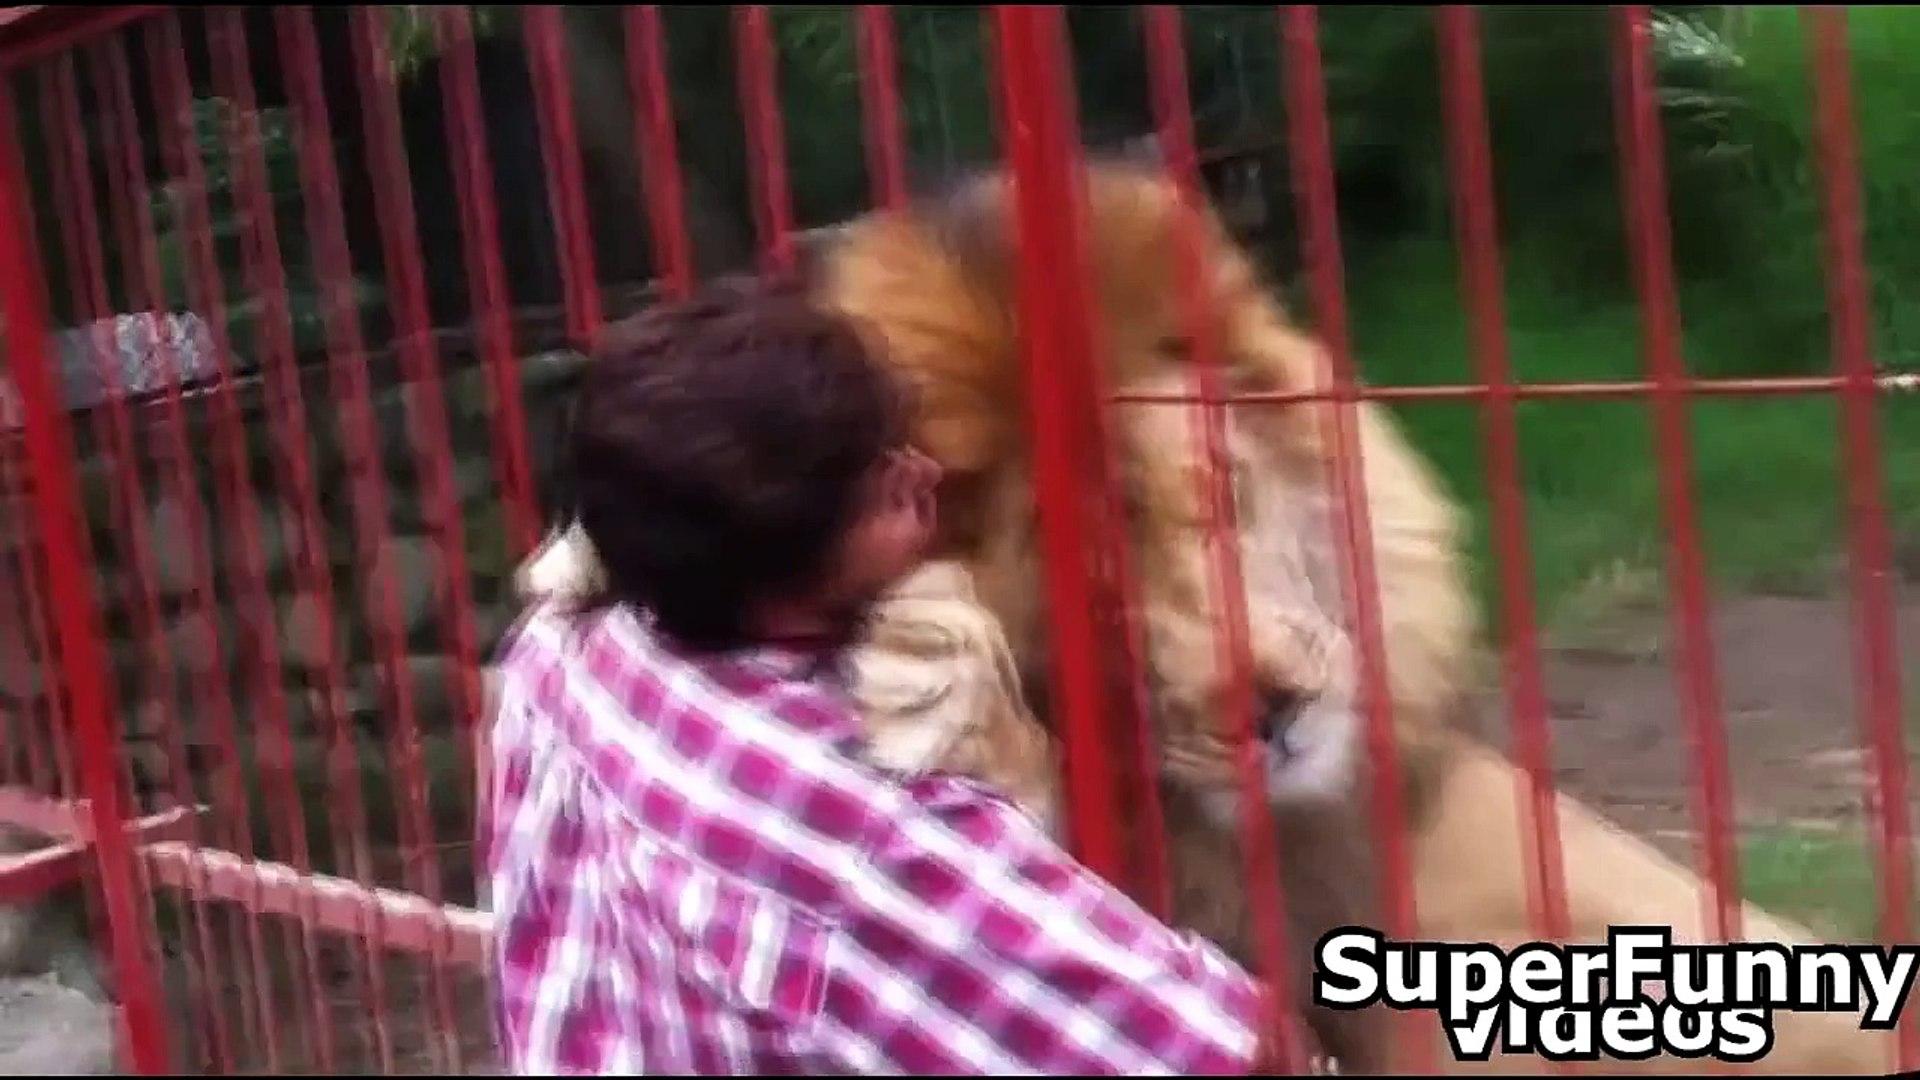 Cute Animal Videos Compilation 2015 Cute Funny Videos Animals 2015